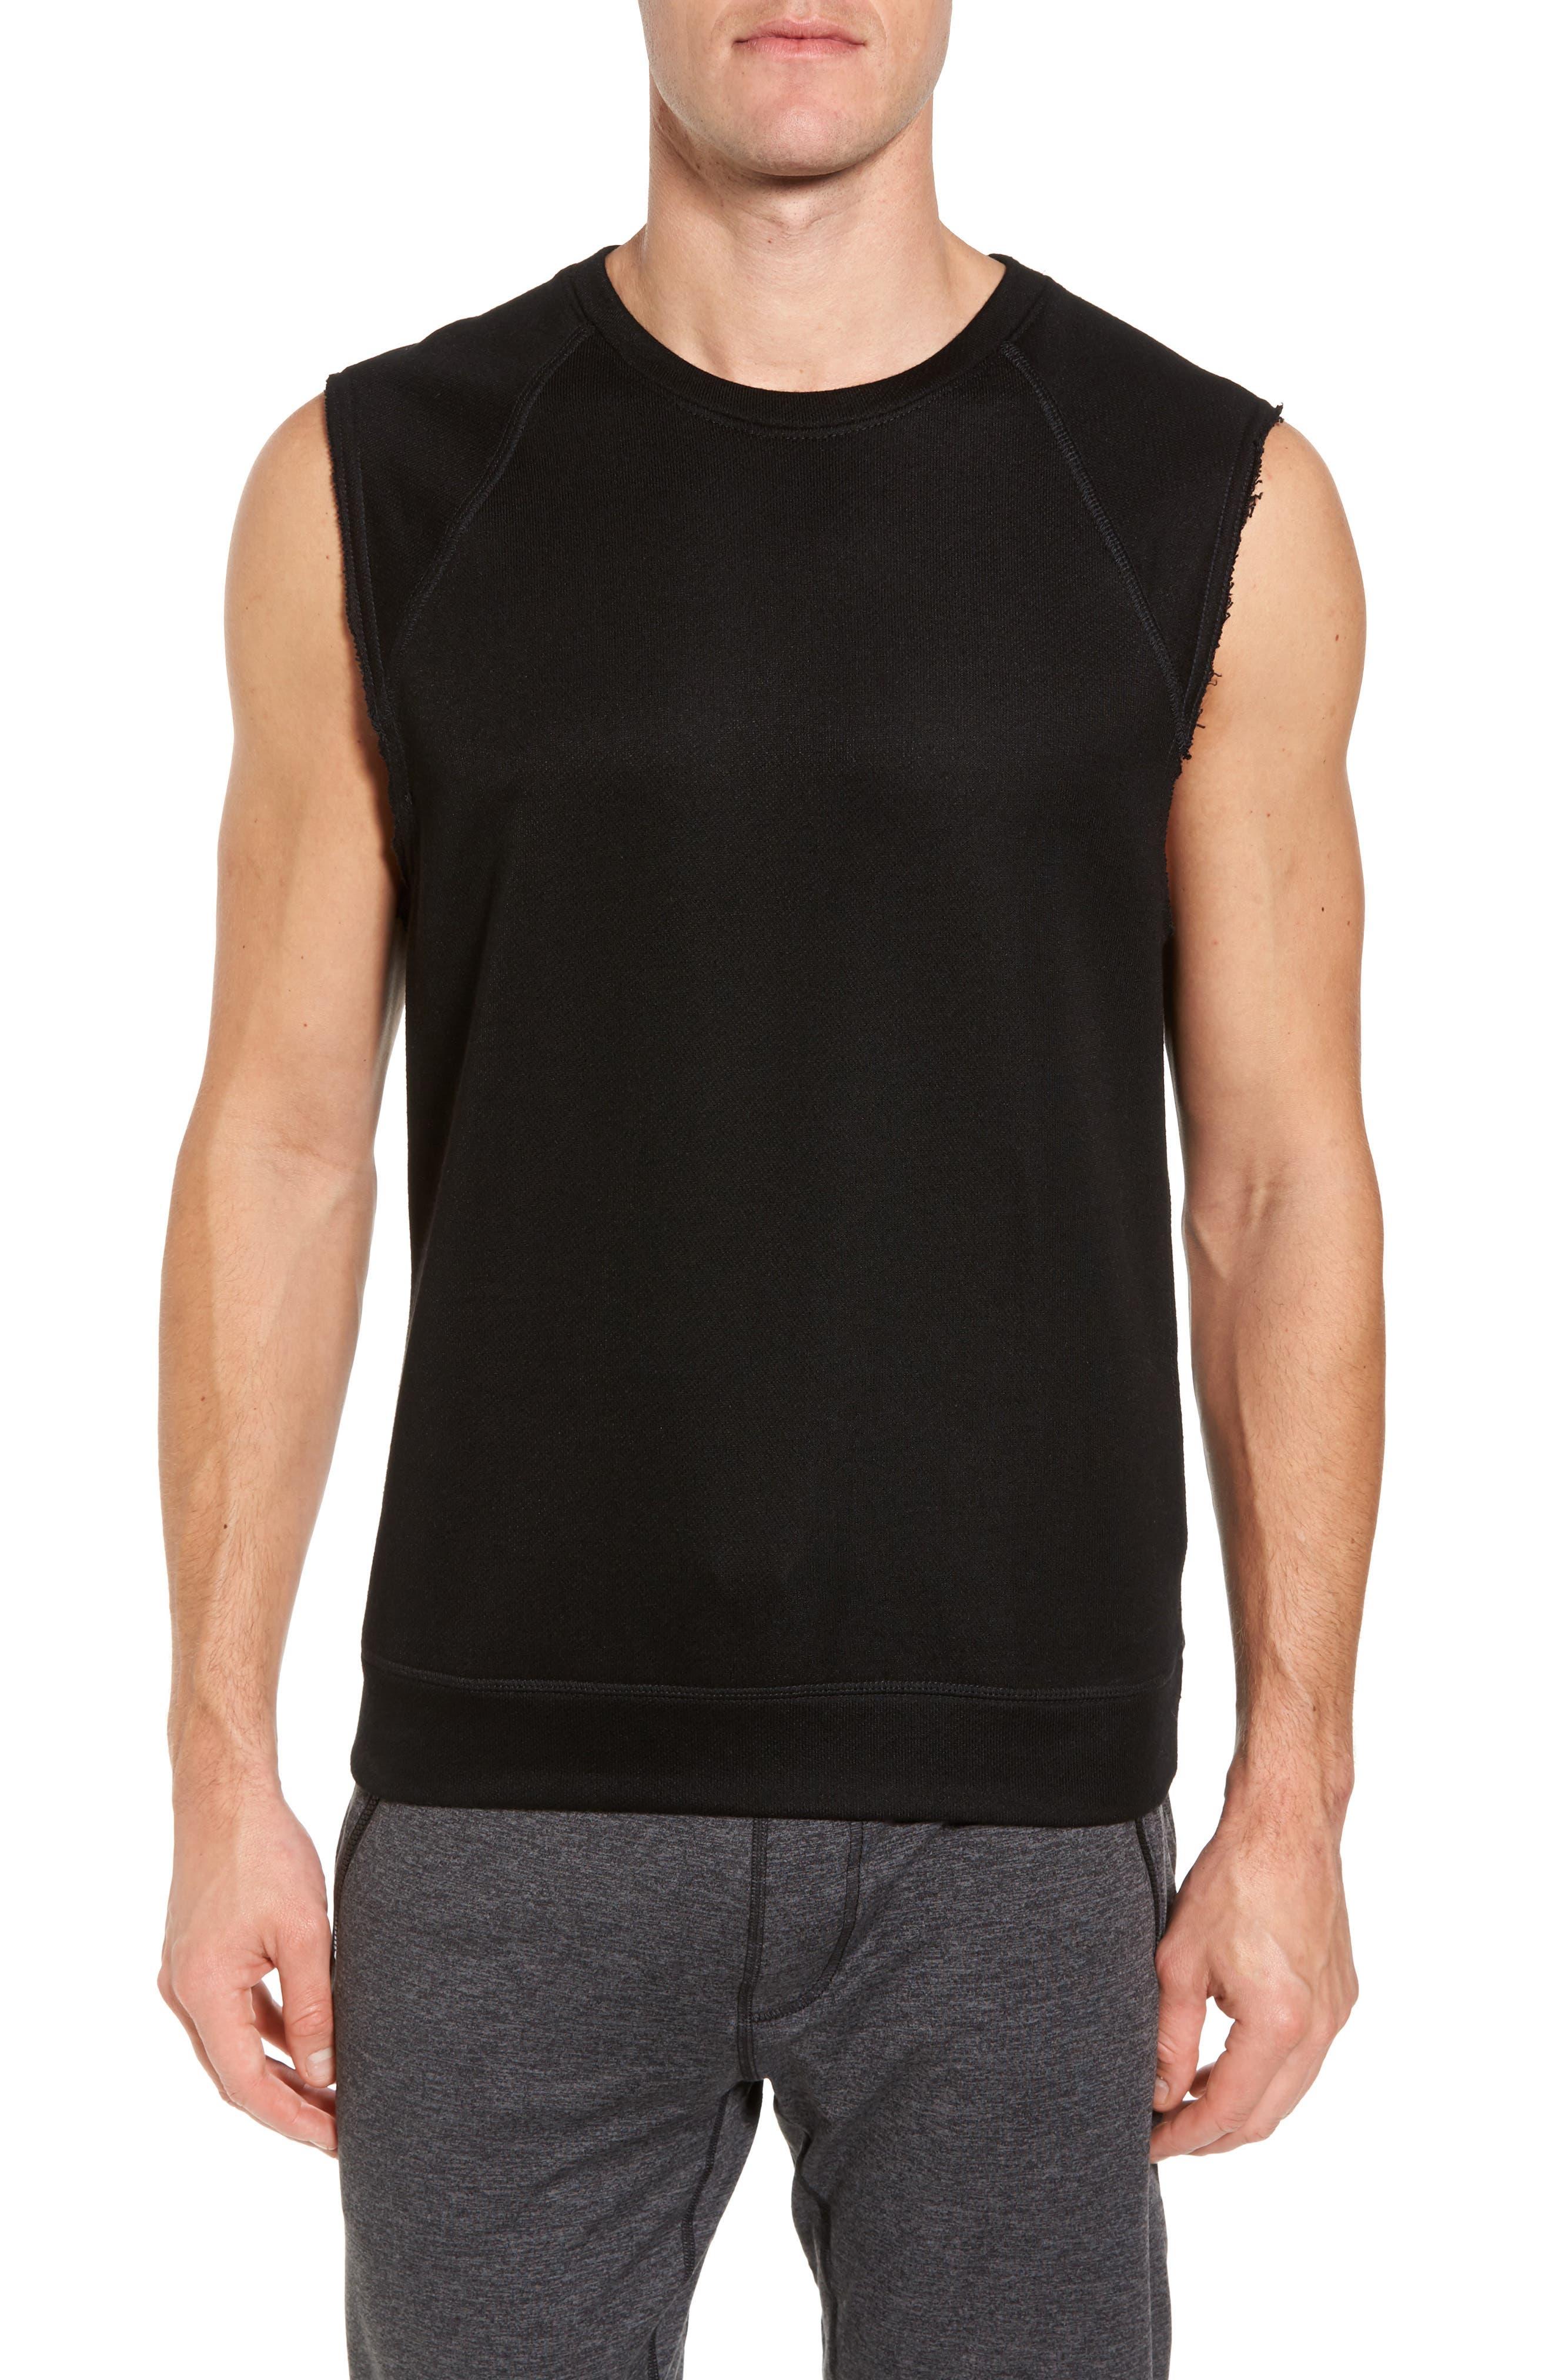 ALO, Dosha Relaxed Fit Sweatshirt Tank, Main thumbnail 1, color, BLACK